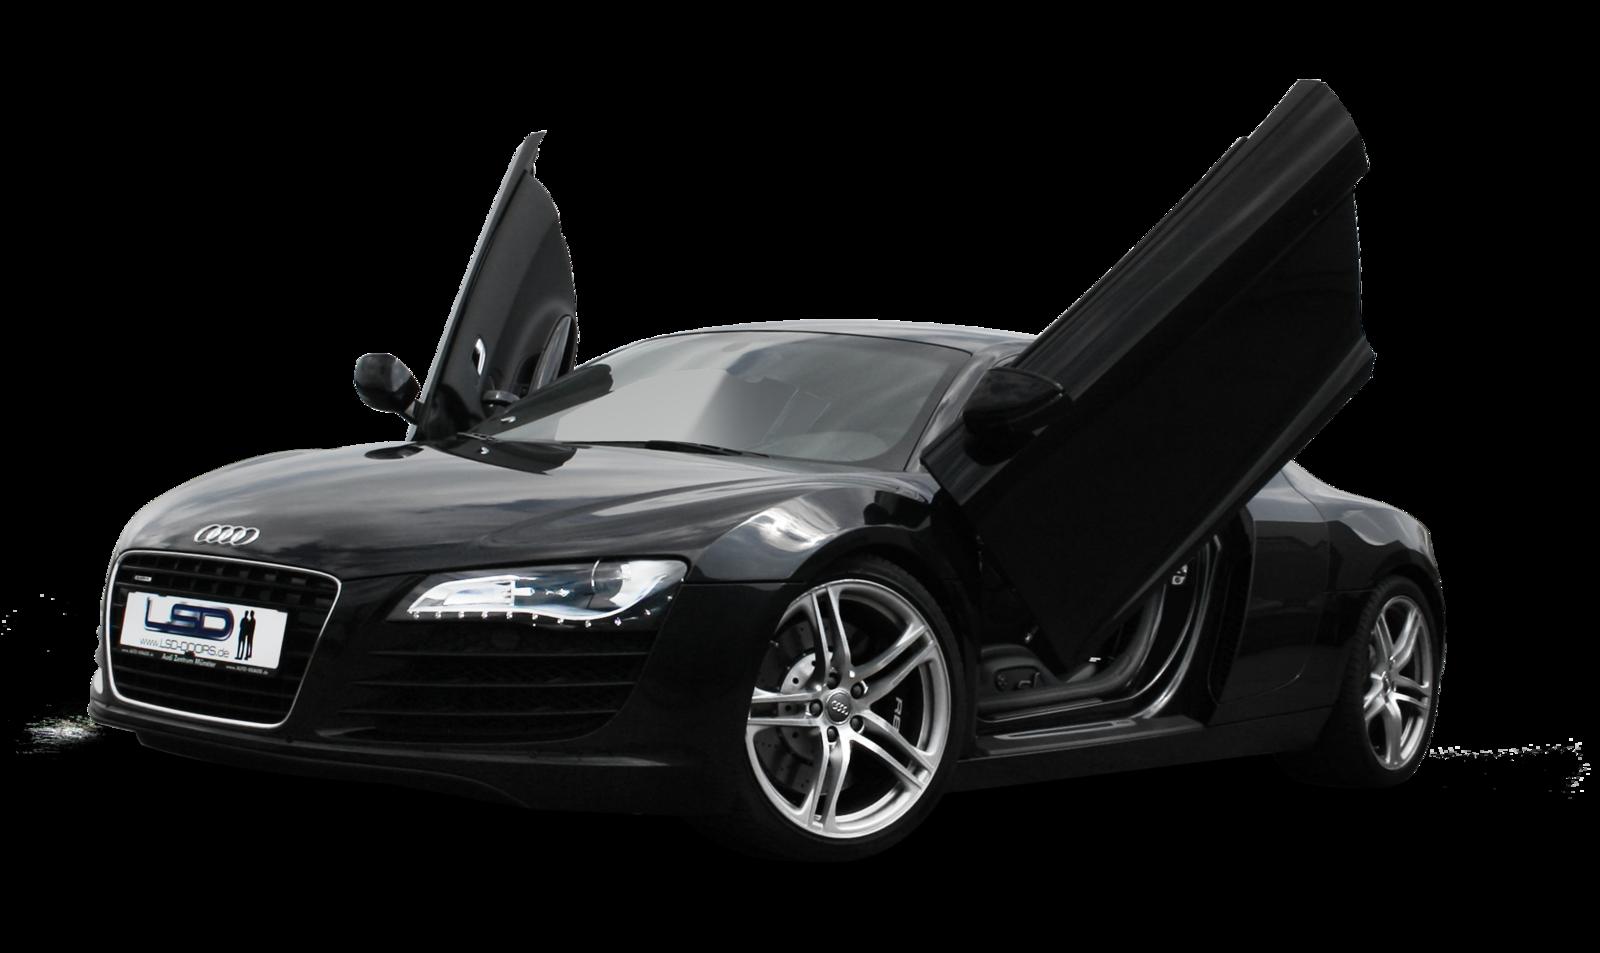 12 Black Car Icon Transparent Background Images - Car ...